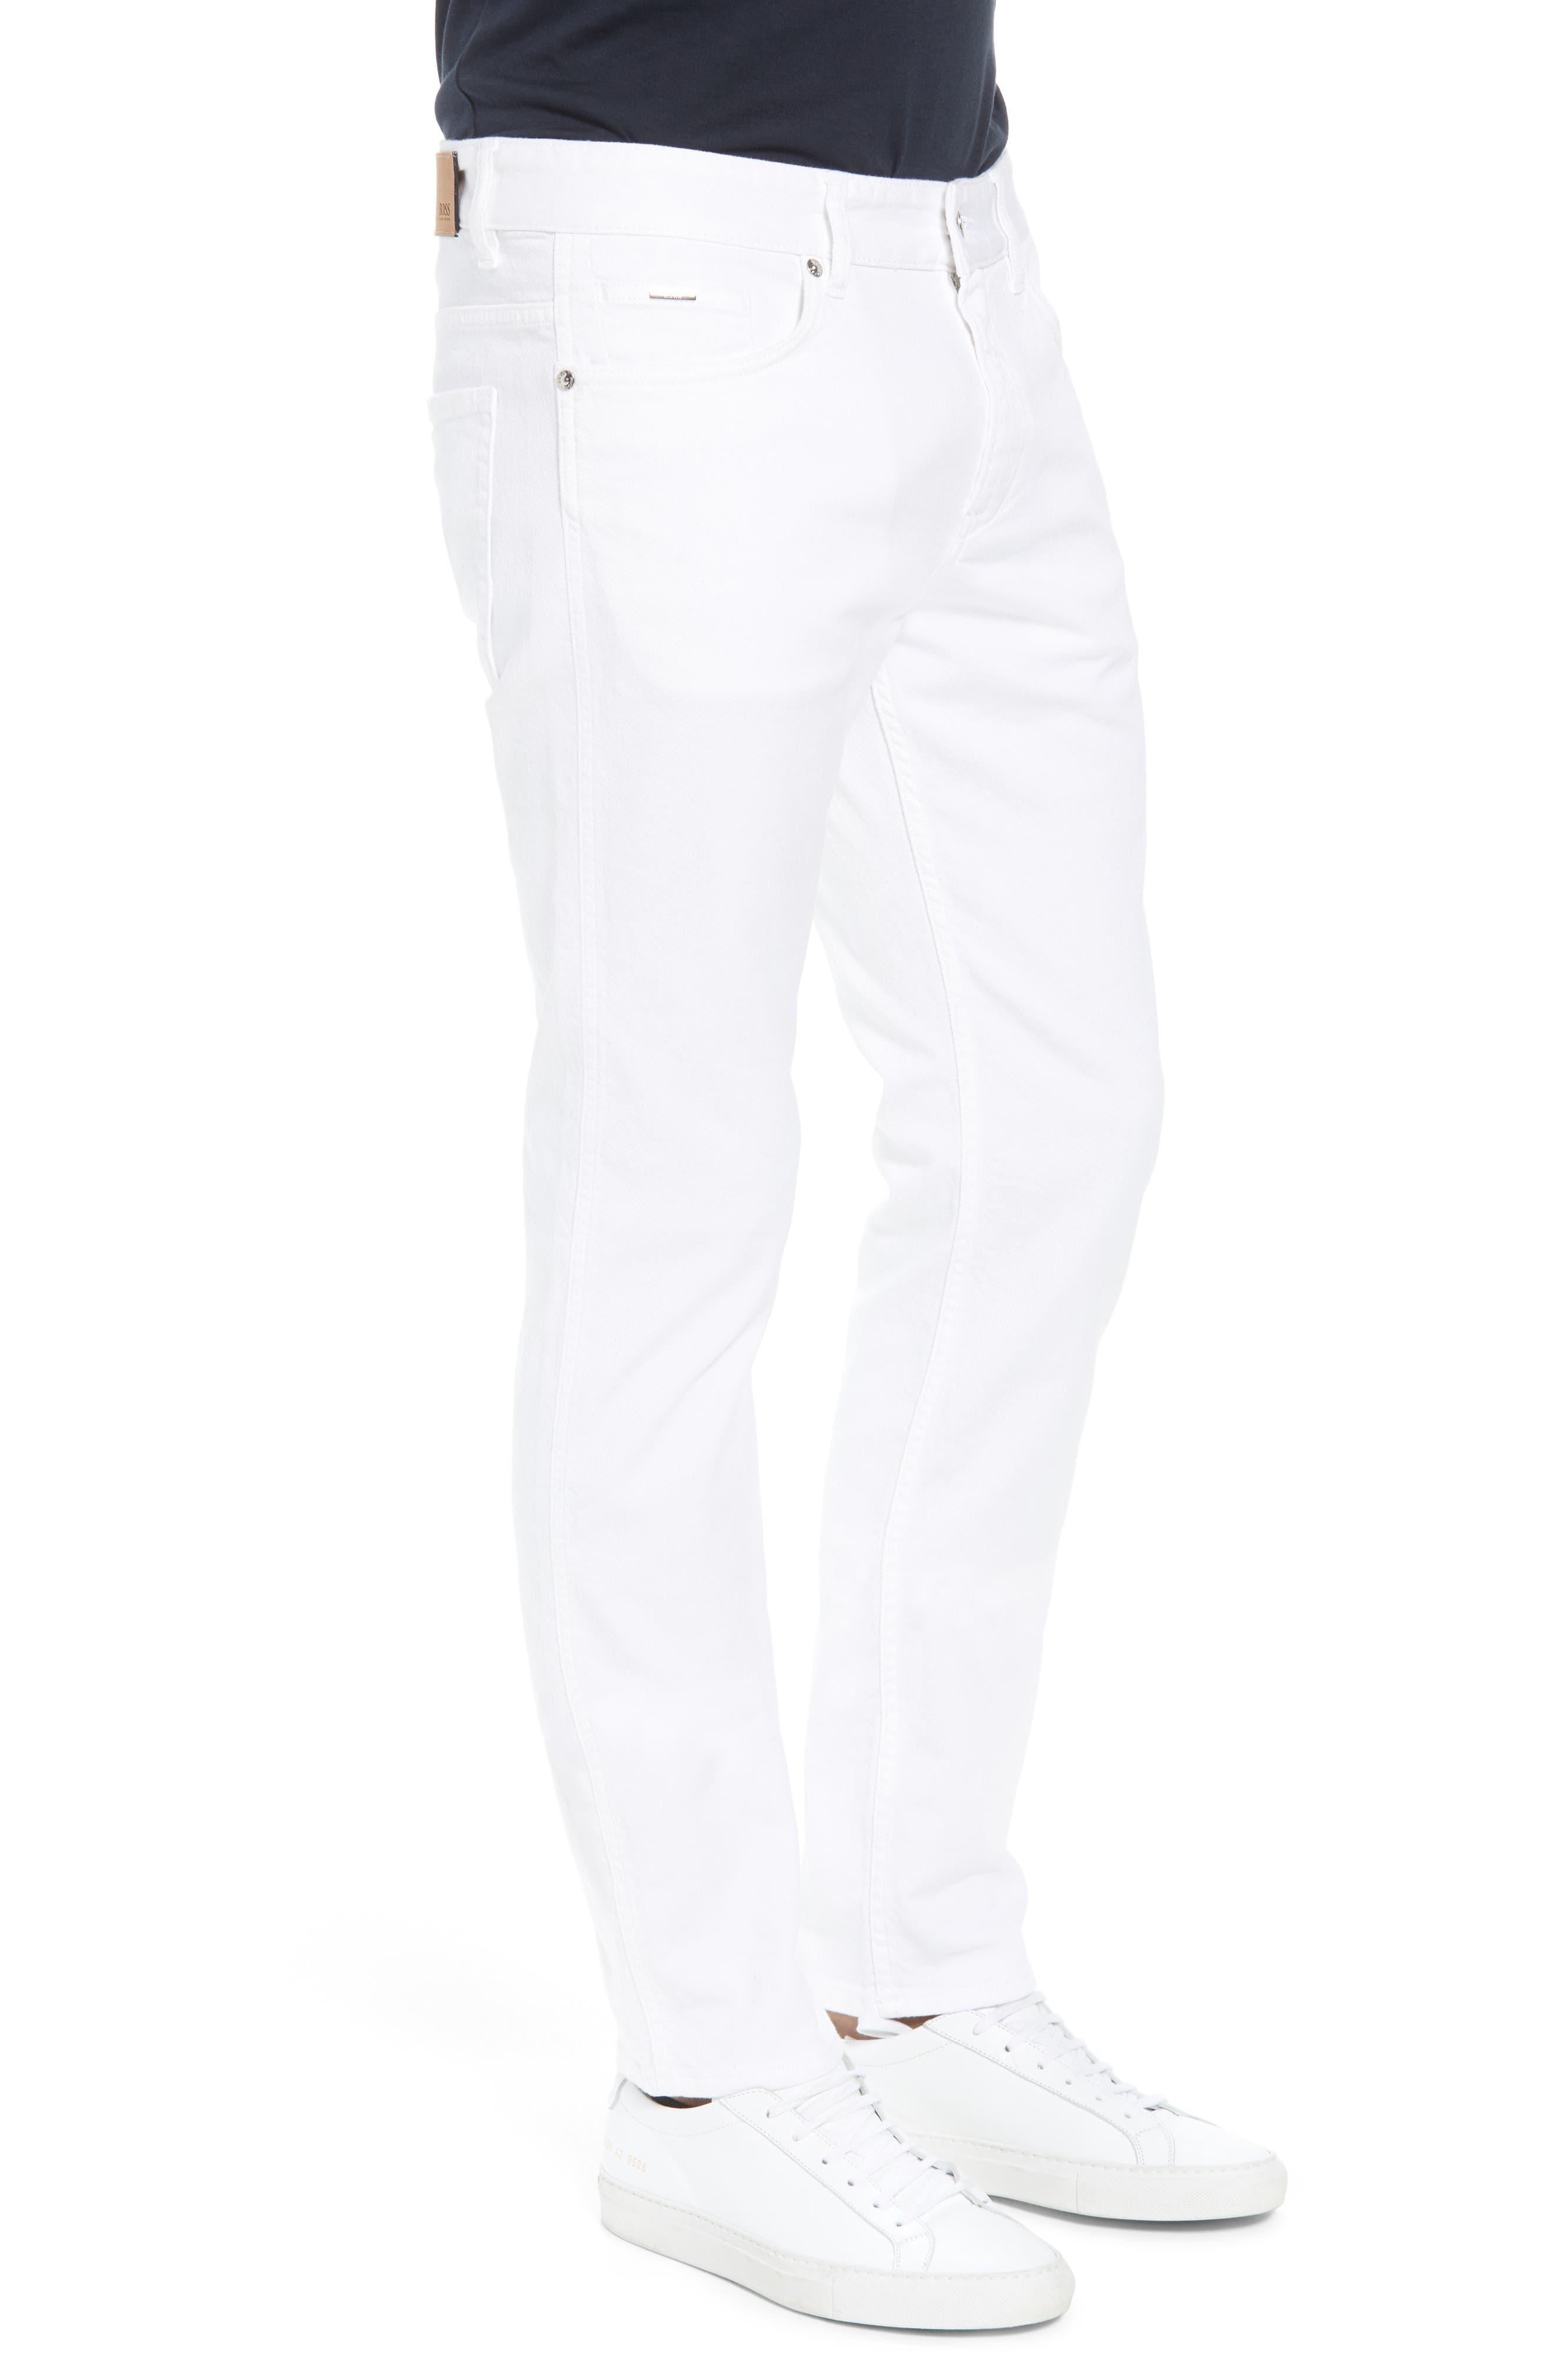 Delaware Slim Fit Jeans,                             Alternate thumbnail 3, color,                             White